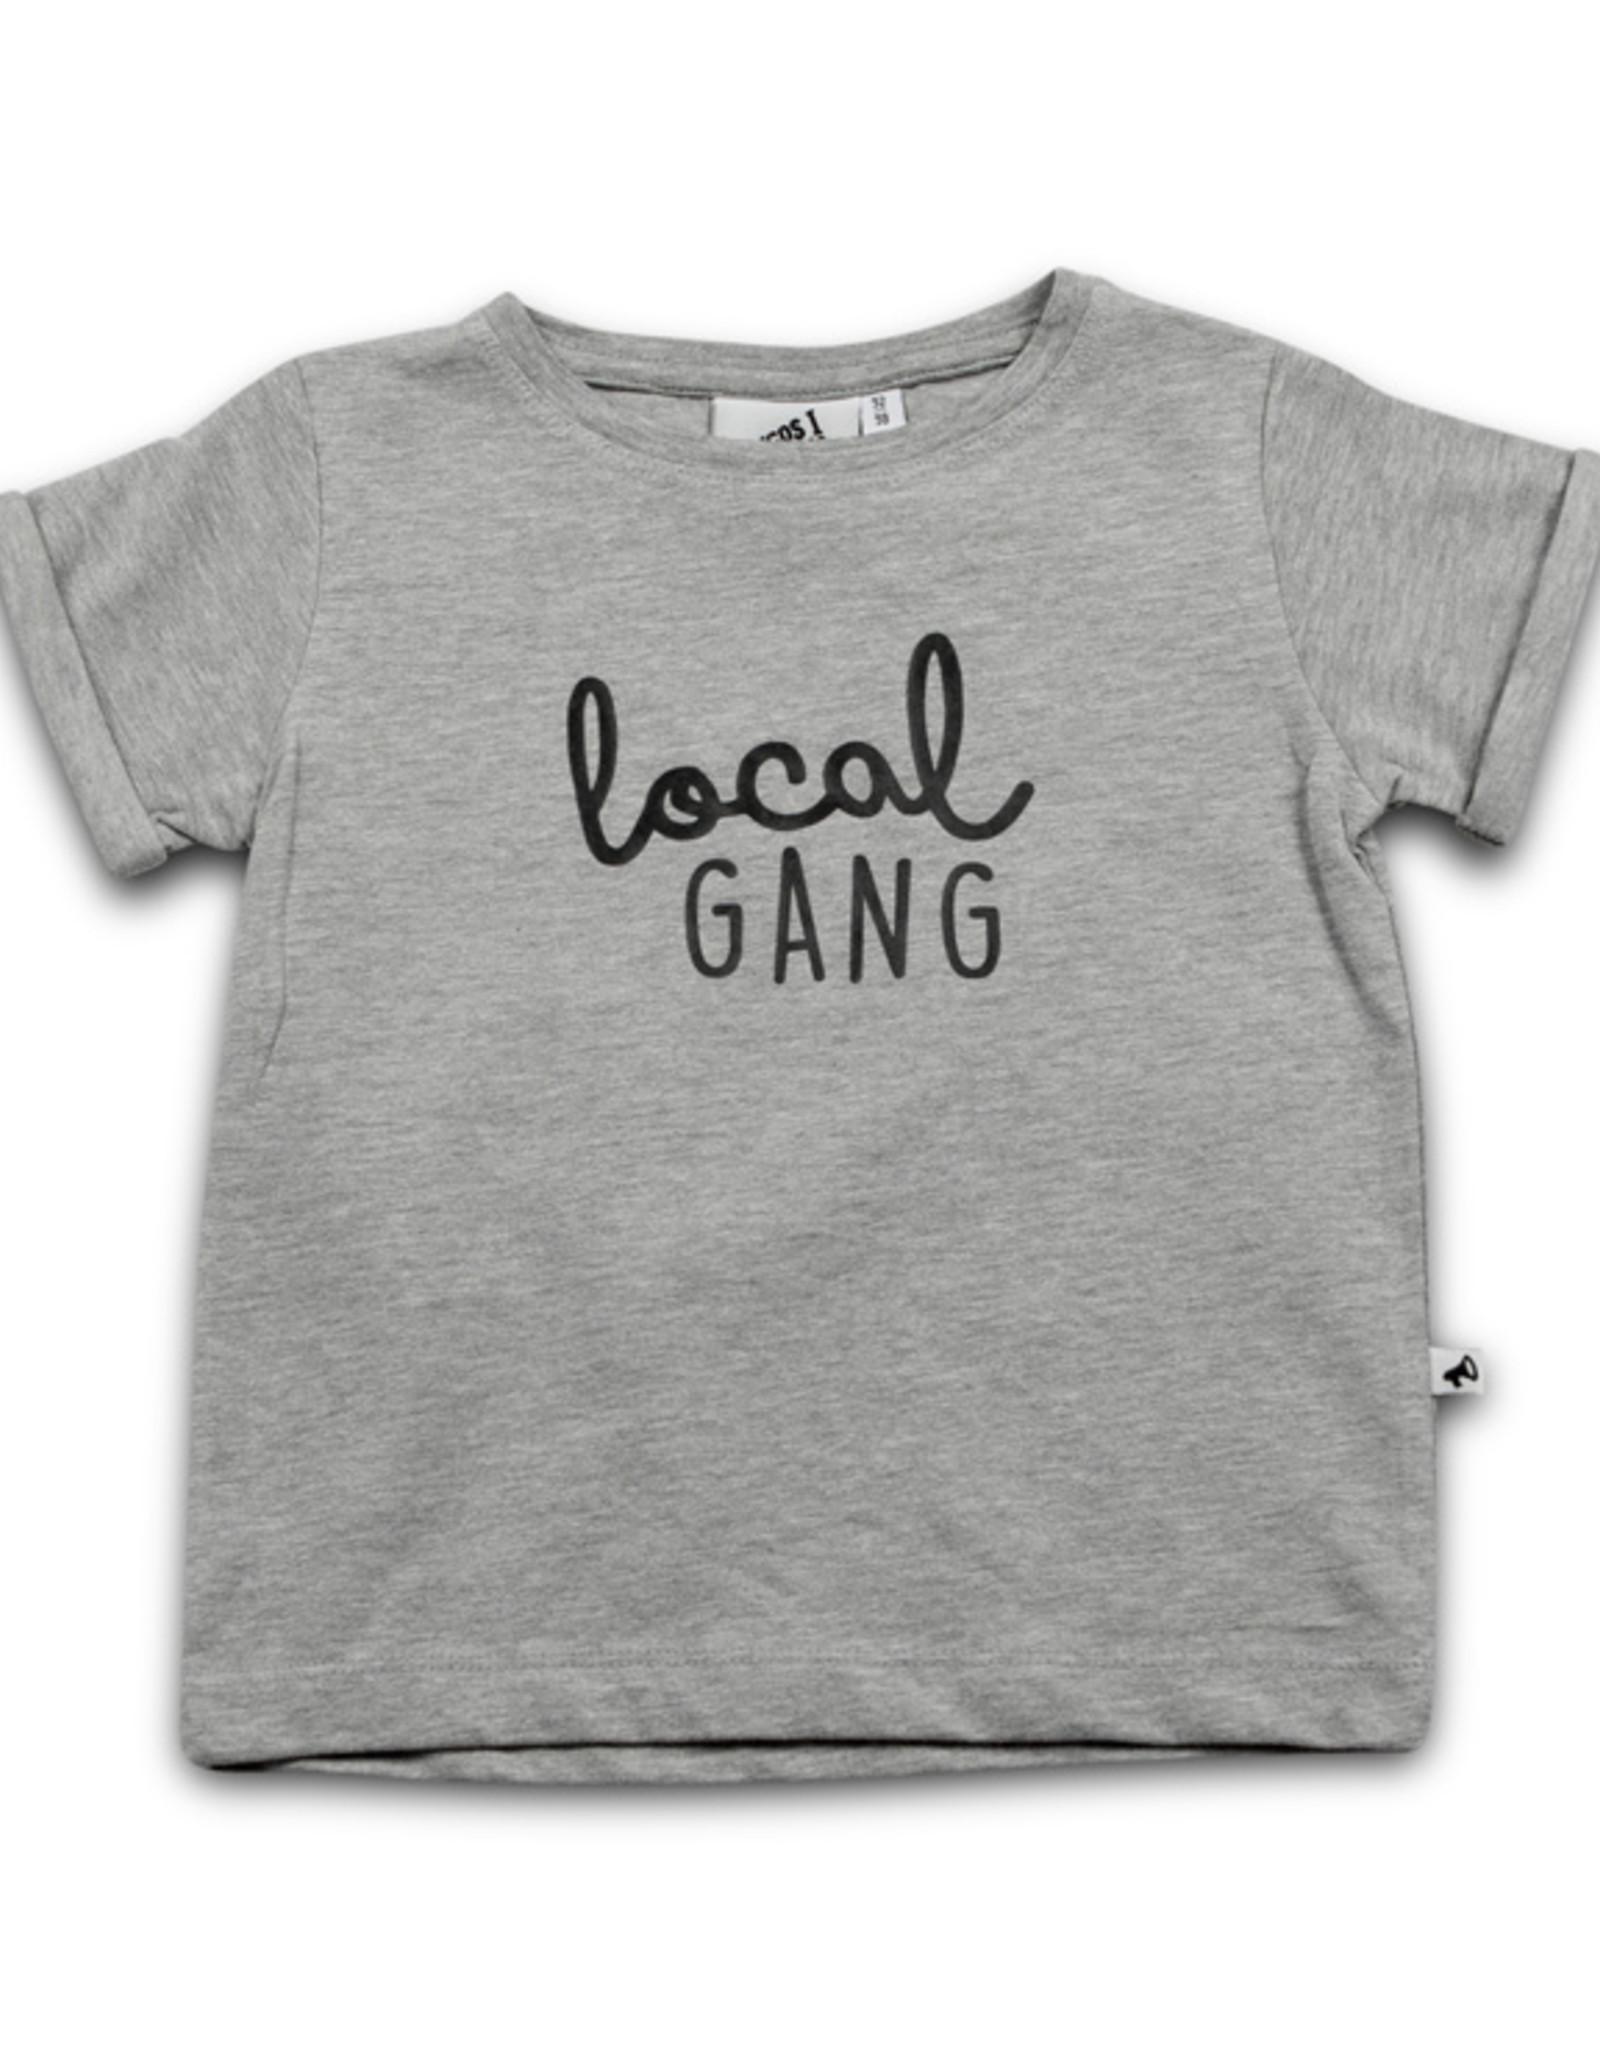 Cos i said so - Local gang shirt - Grey